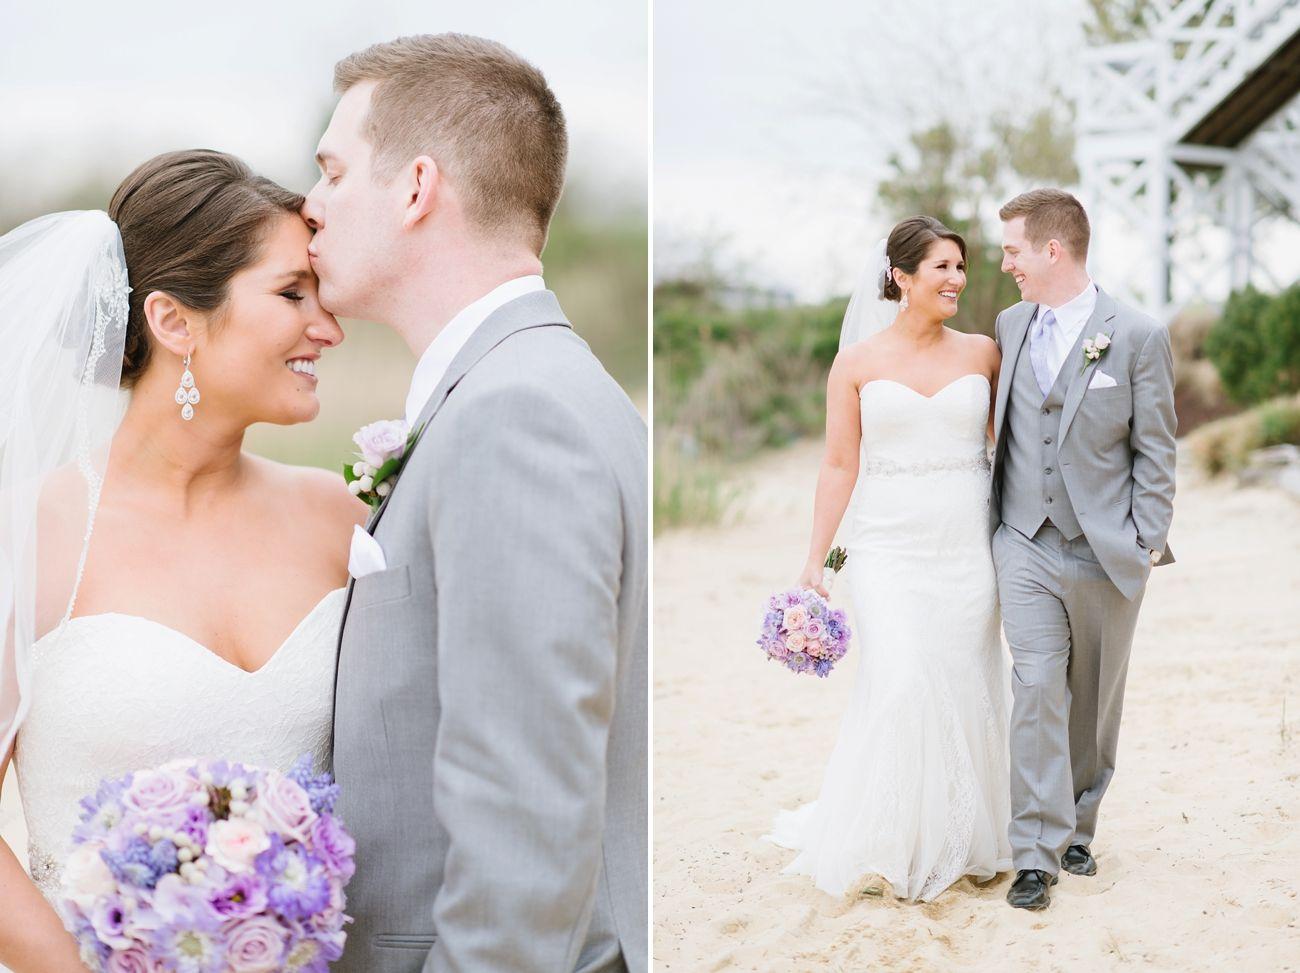 Chesapeake Bay Beach Club Wedding | Purple Spring Wedding Inspiration by Natalie Franke